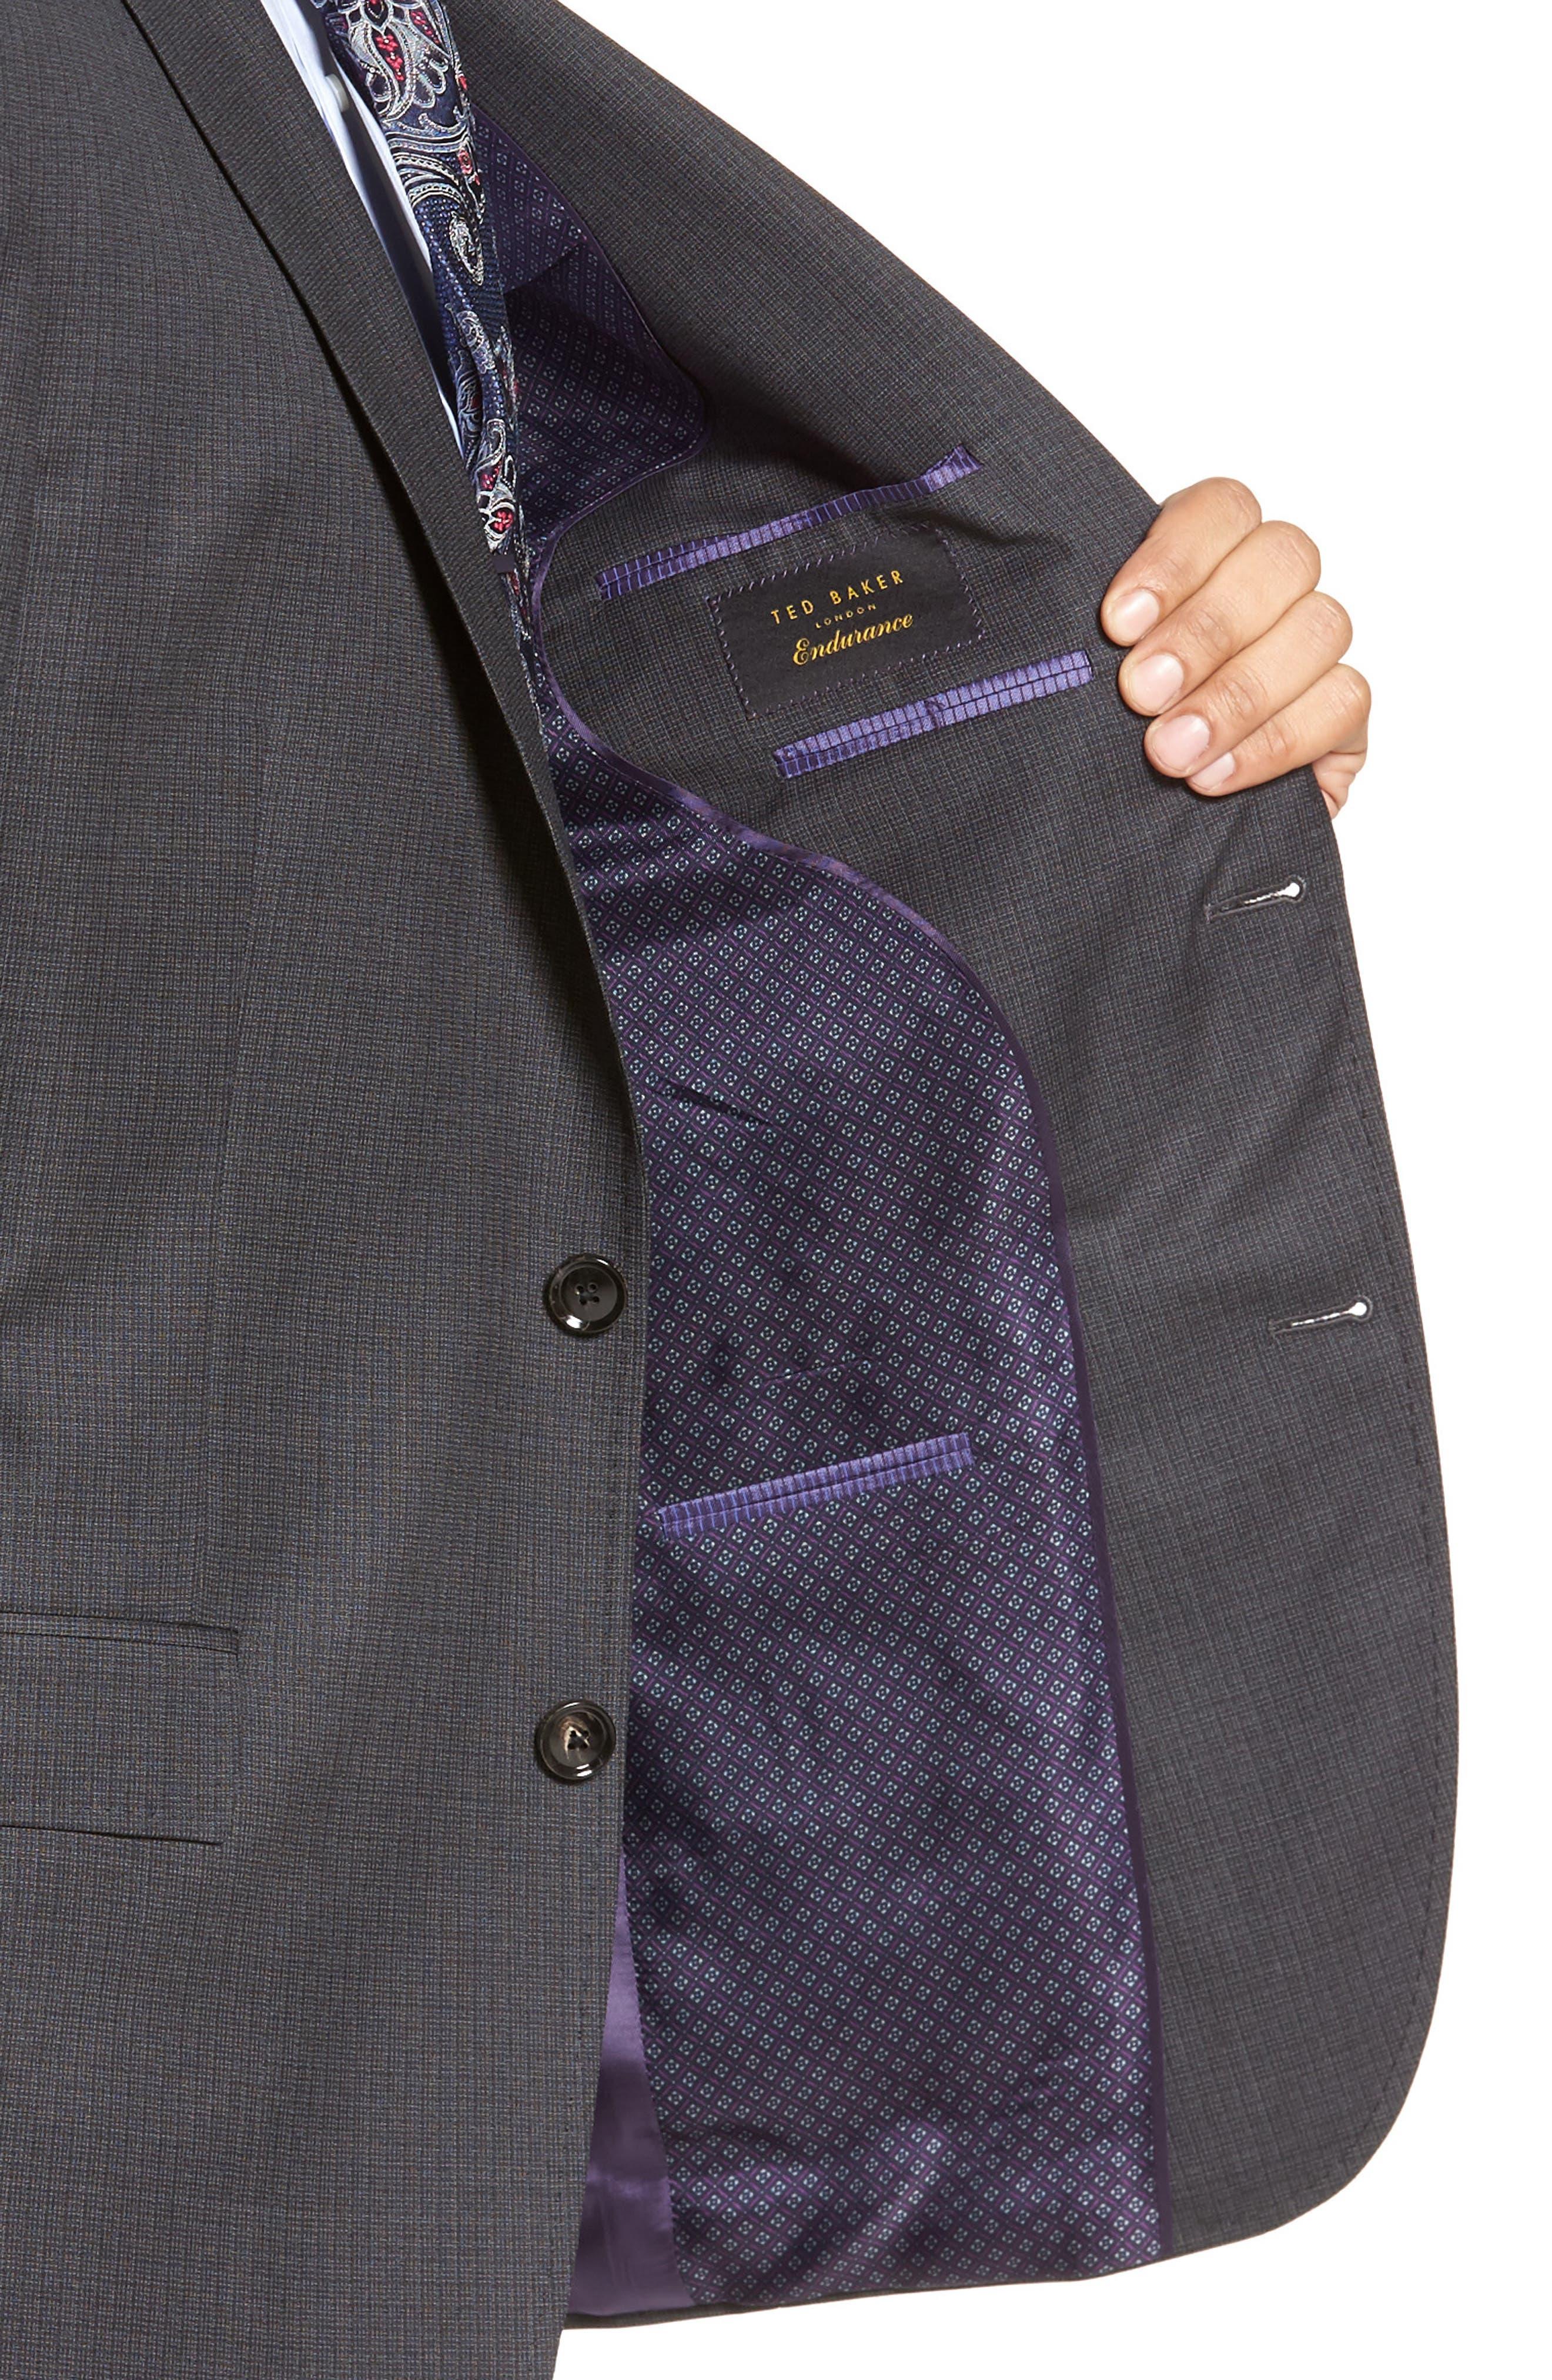 Jay Trim Fit Check Wool Suit,                             Alternate thumbnail 4, color,                             020